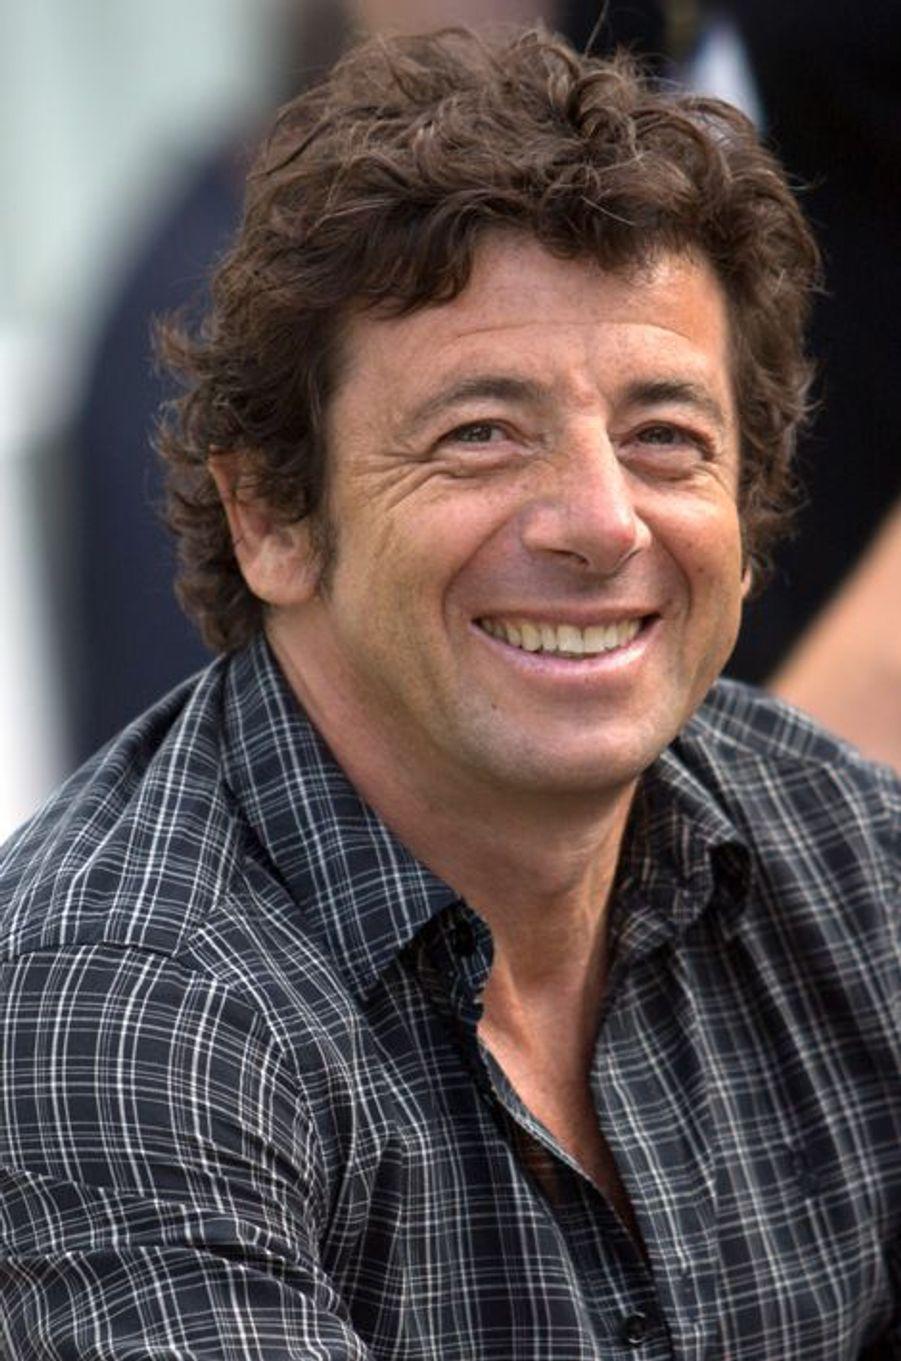 Patrick Bruel à Angoulême le 22 août 2014.